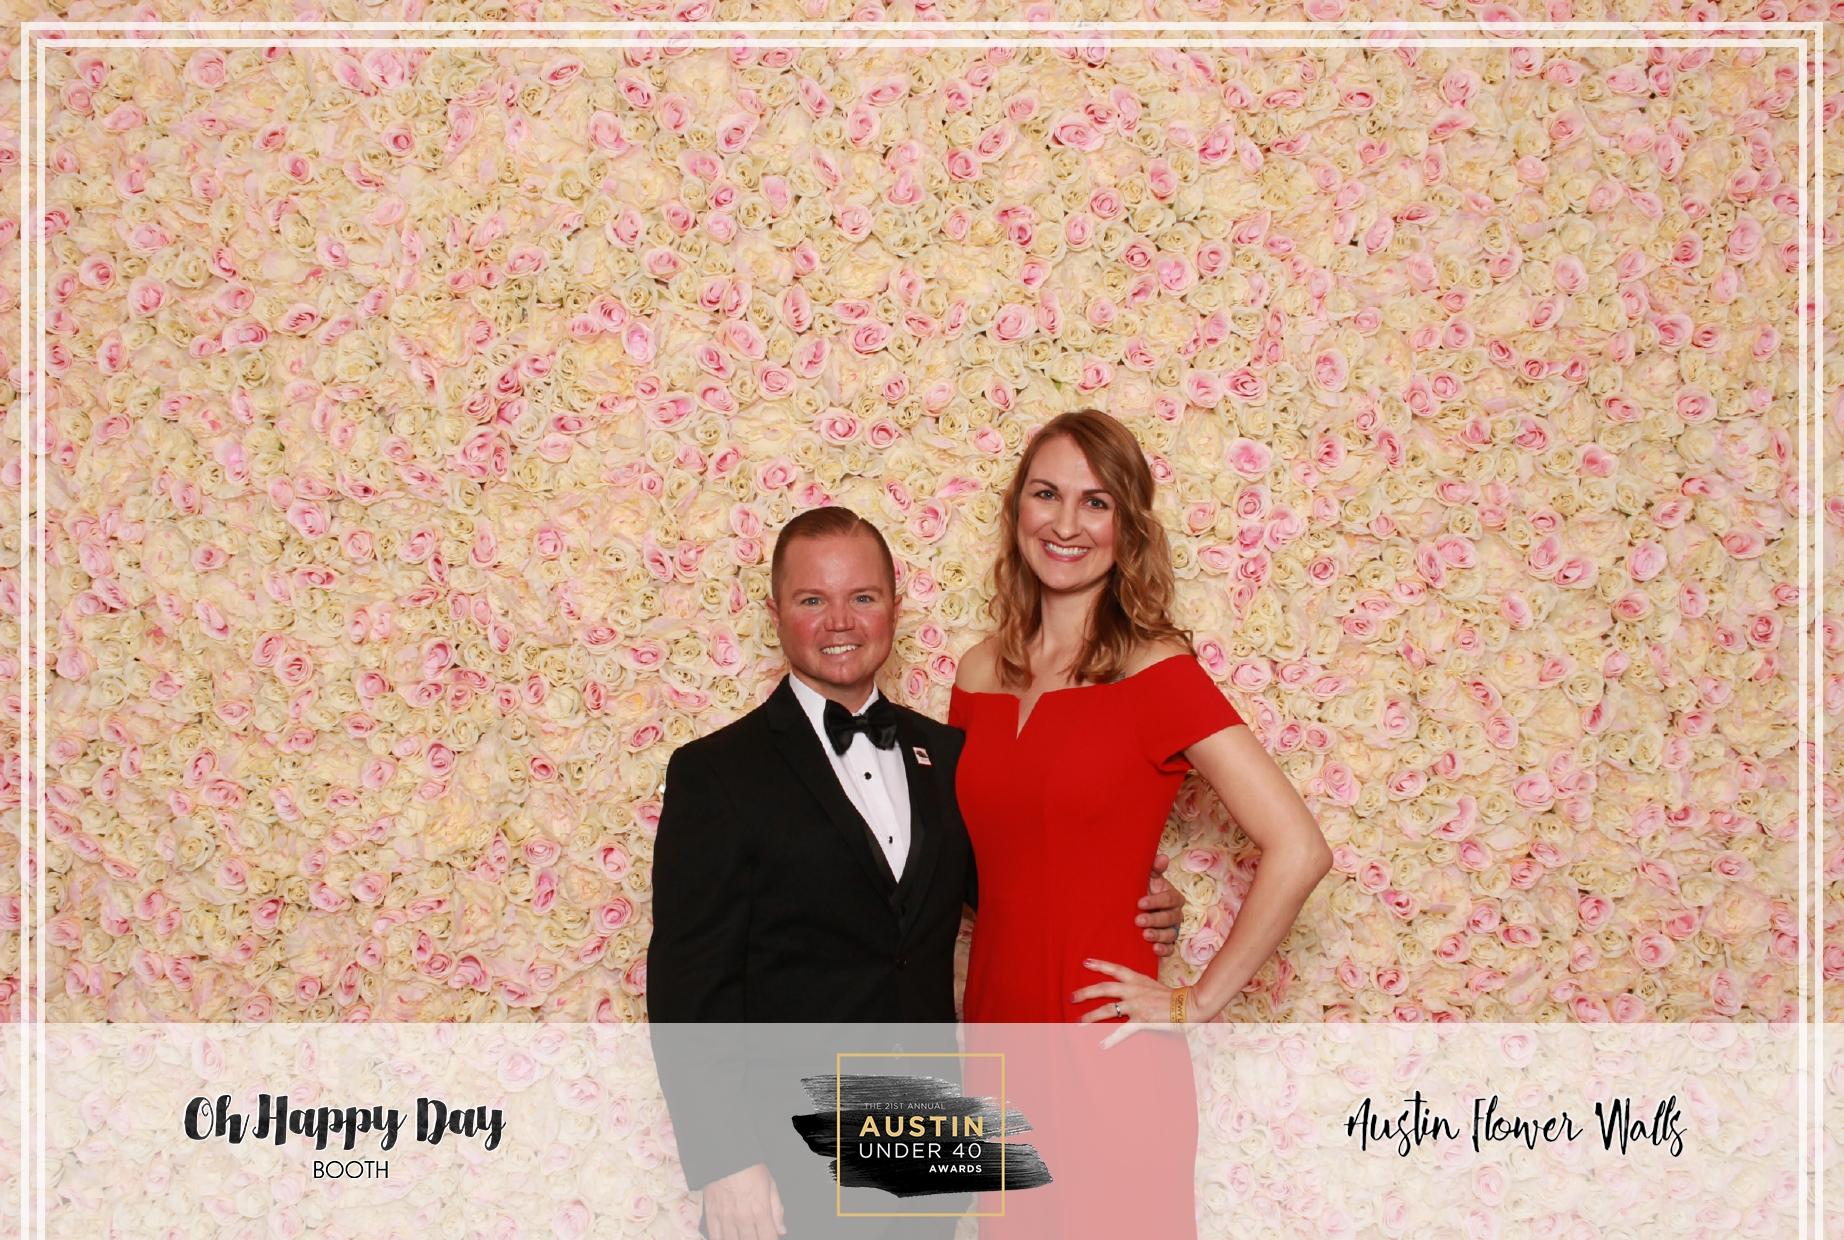 Oh Happy Day Booth - Austin Under 40-38.jpg